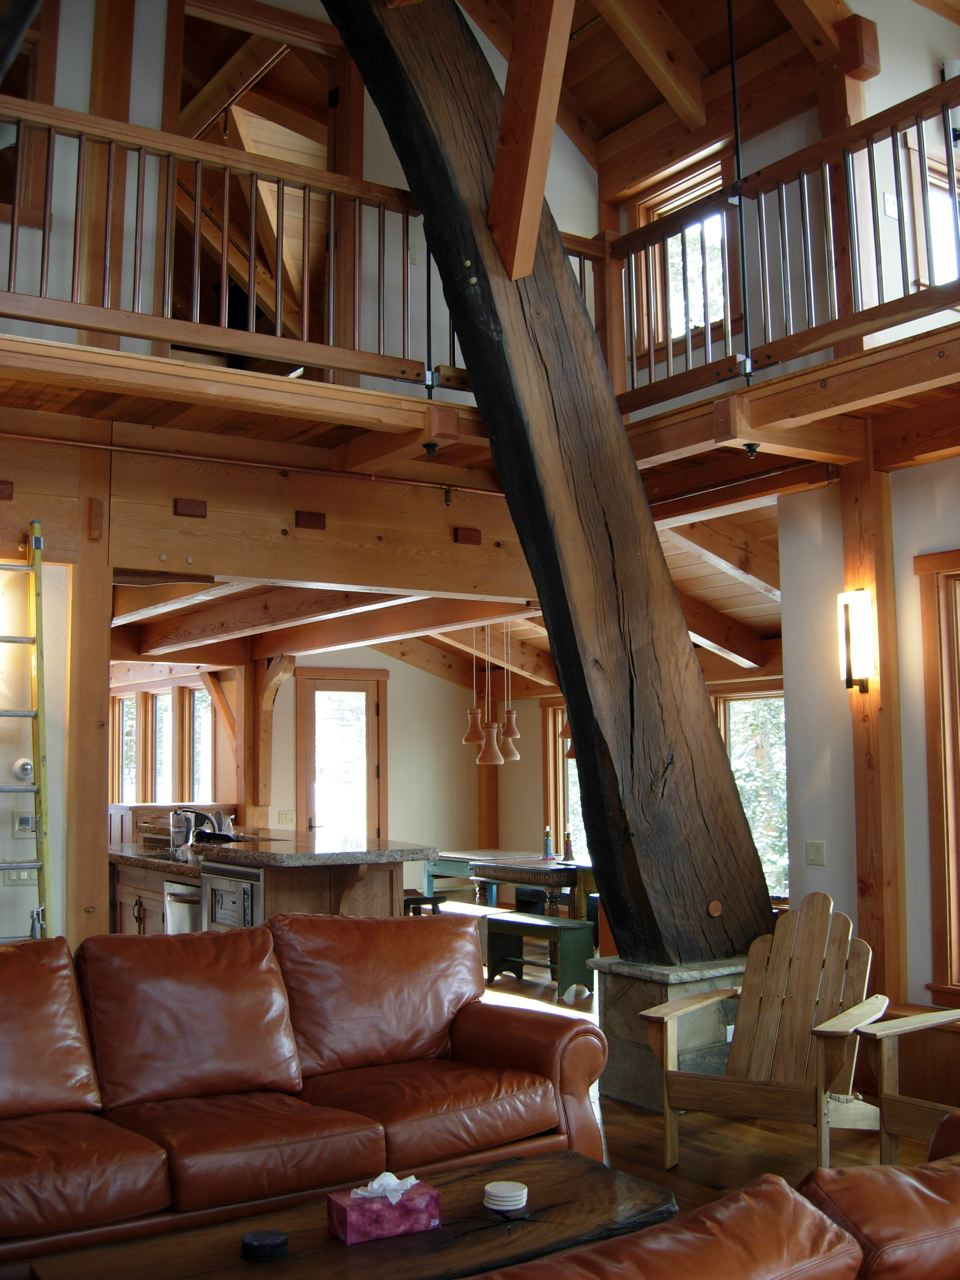 Longleaf Lumber - Reclaimed Live Oak Timber Frame